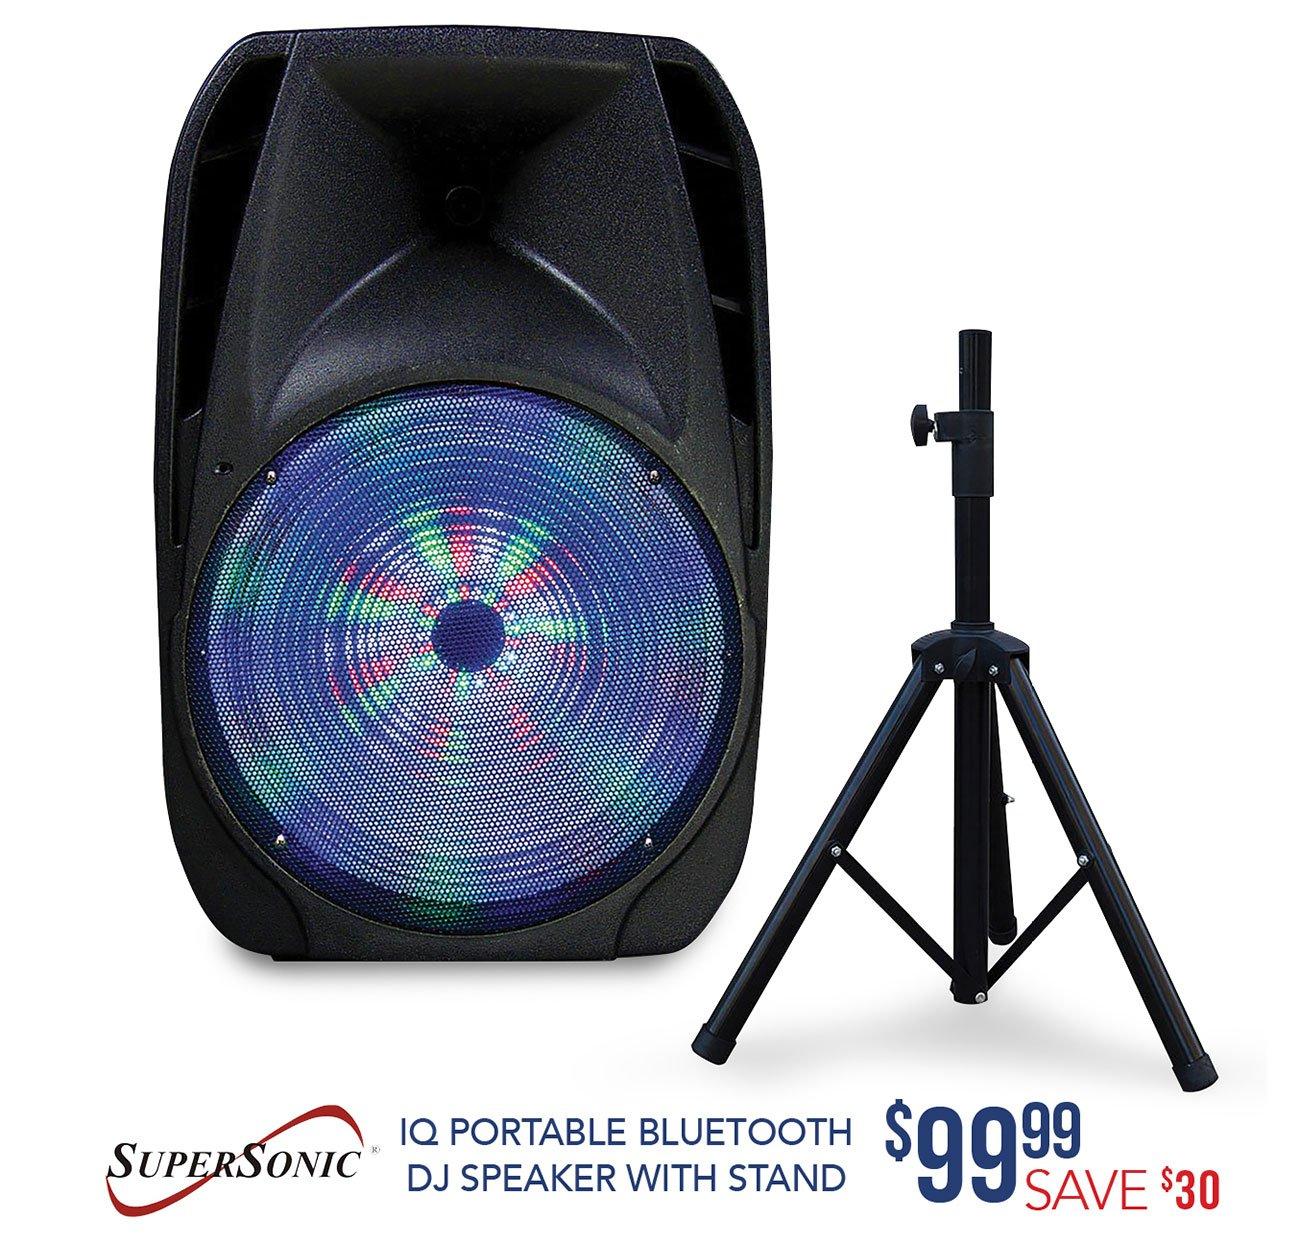 Super-sonic-DJ-Speaker-with-stand